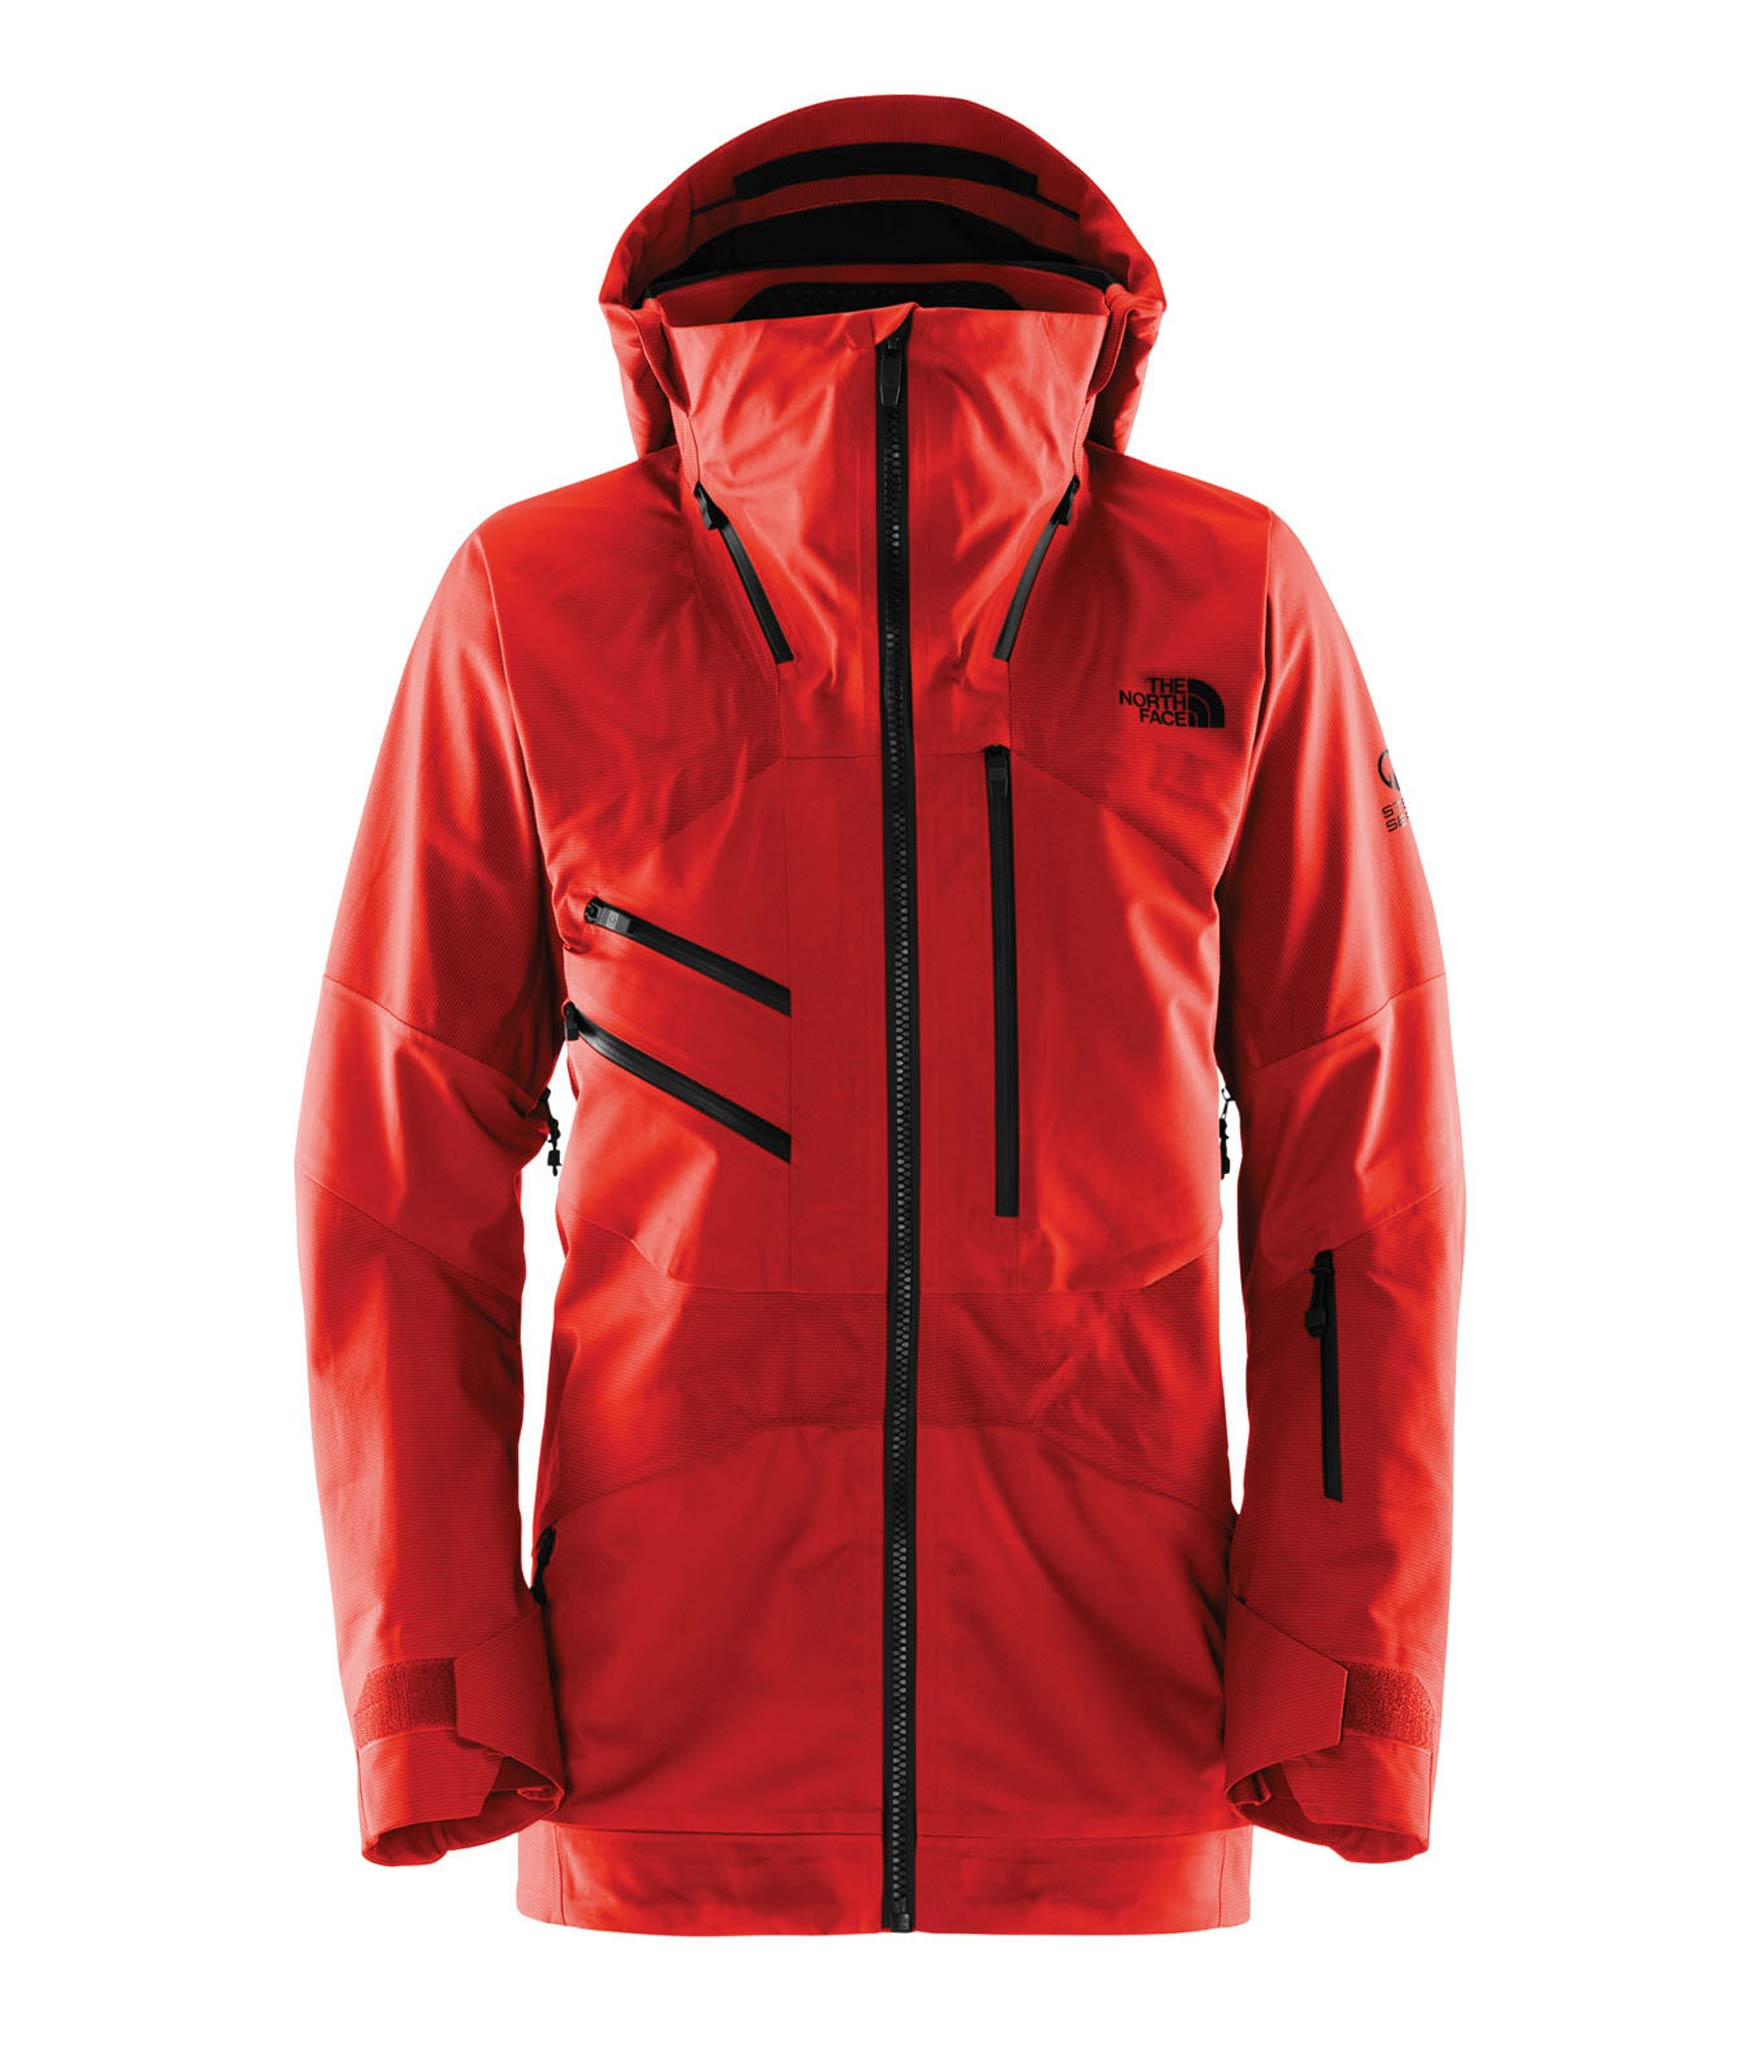 The North Face: Fuse Brigadine Jacket 1819 | Prime Skiing